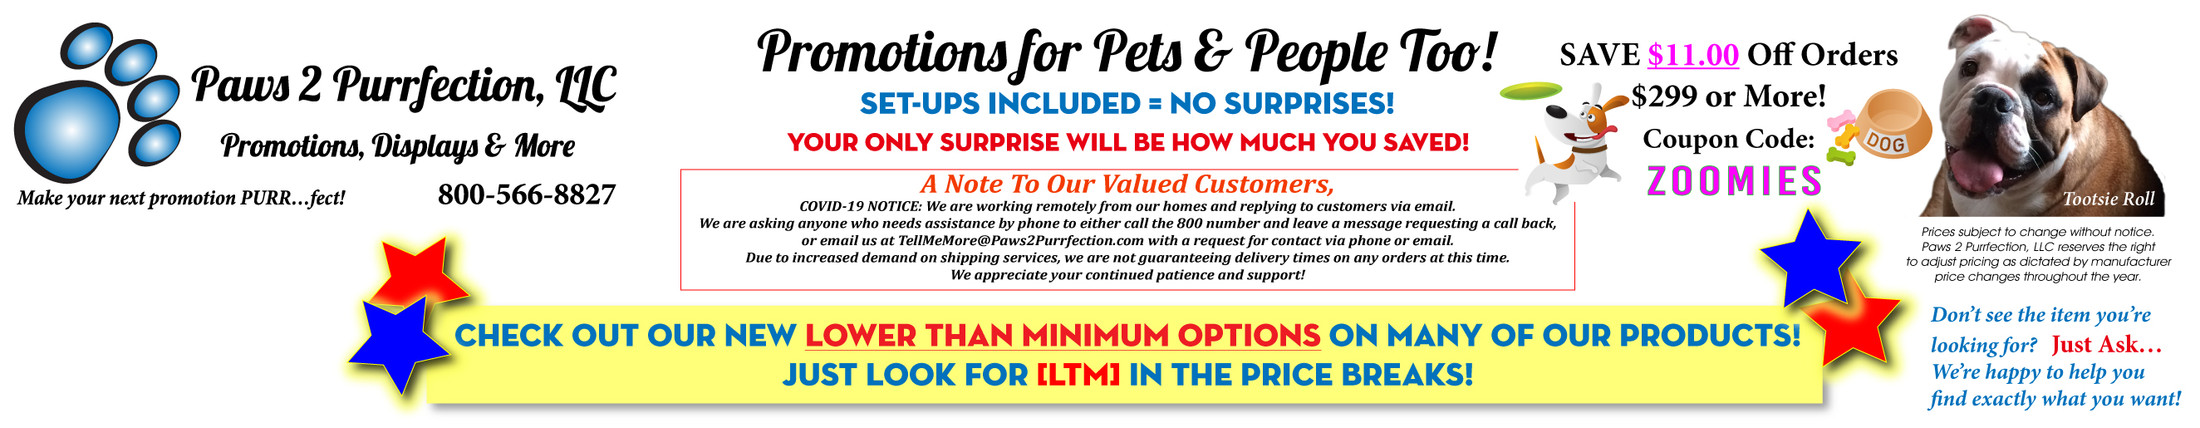 Paws 2 Purrfection, LLC